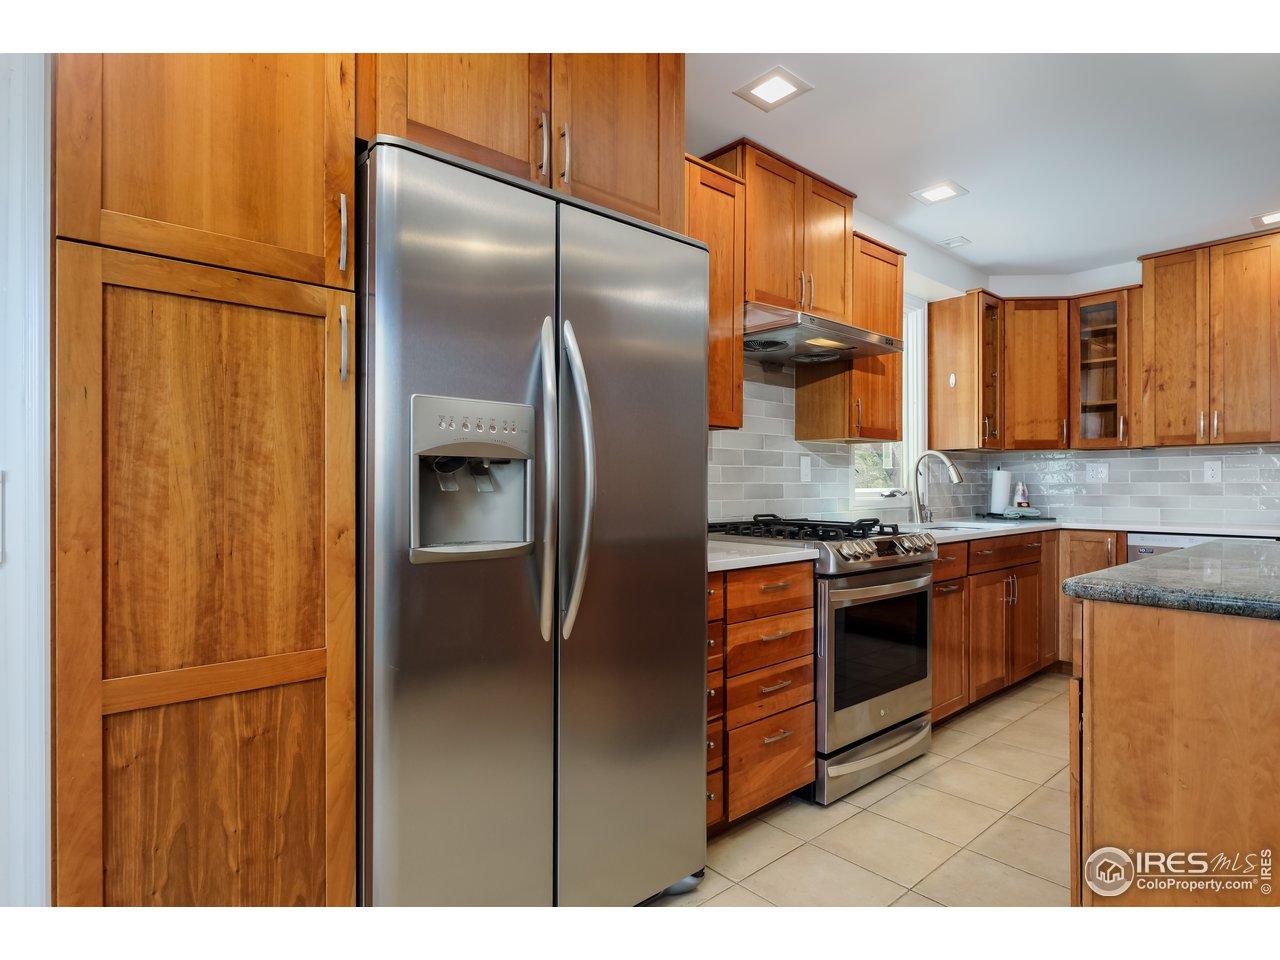 Gorgeous Kitchen w/ Cherry Cabinets